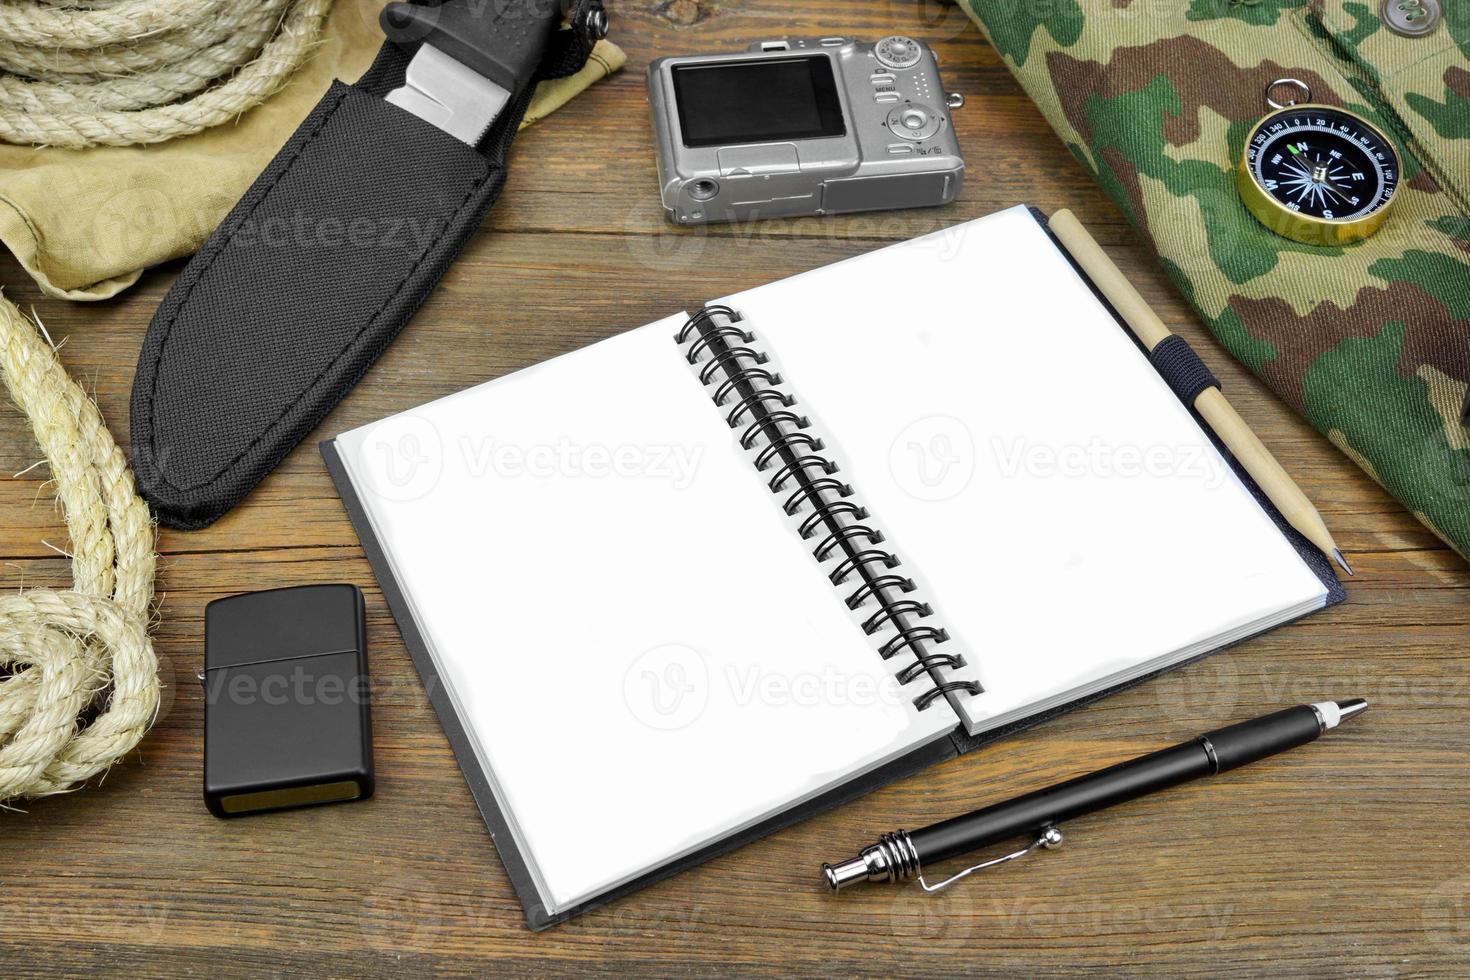 Reisevorbereitung. offenes Notizbuch, Kamera, Seil, Kompass, Stift, foto